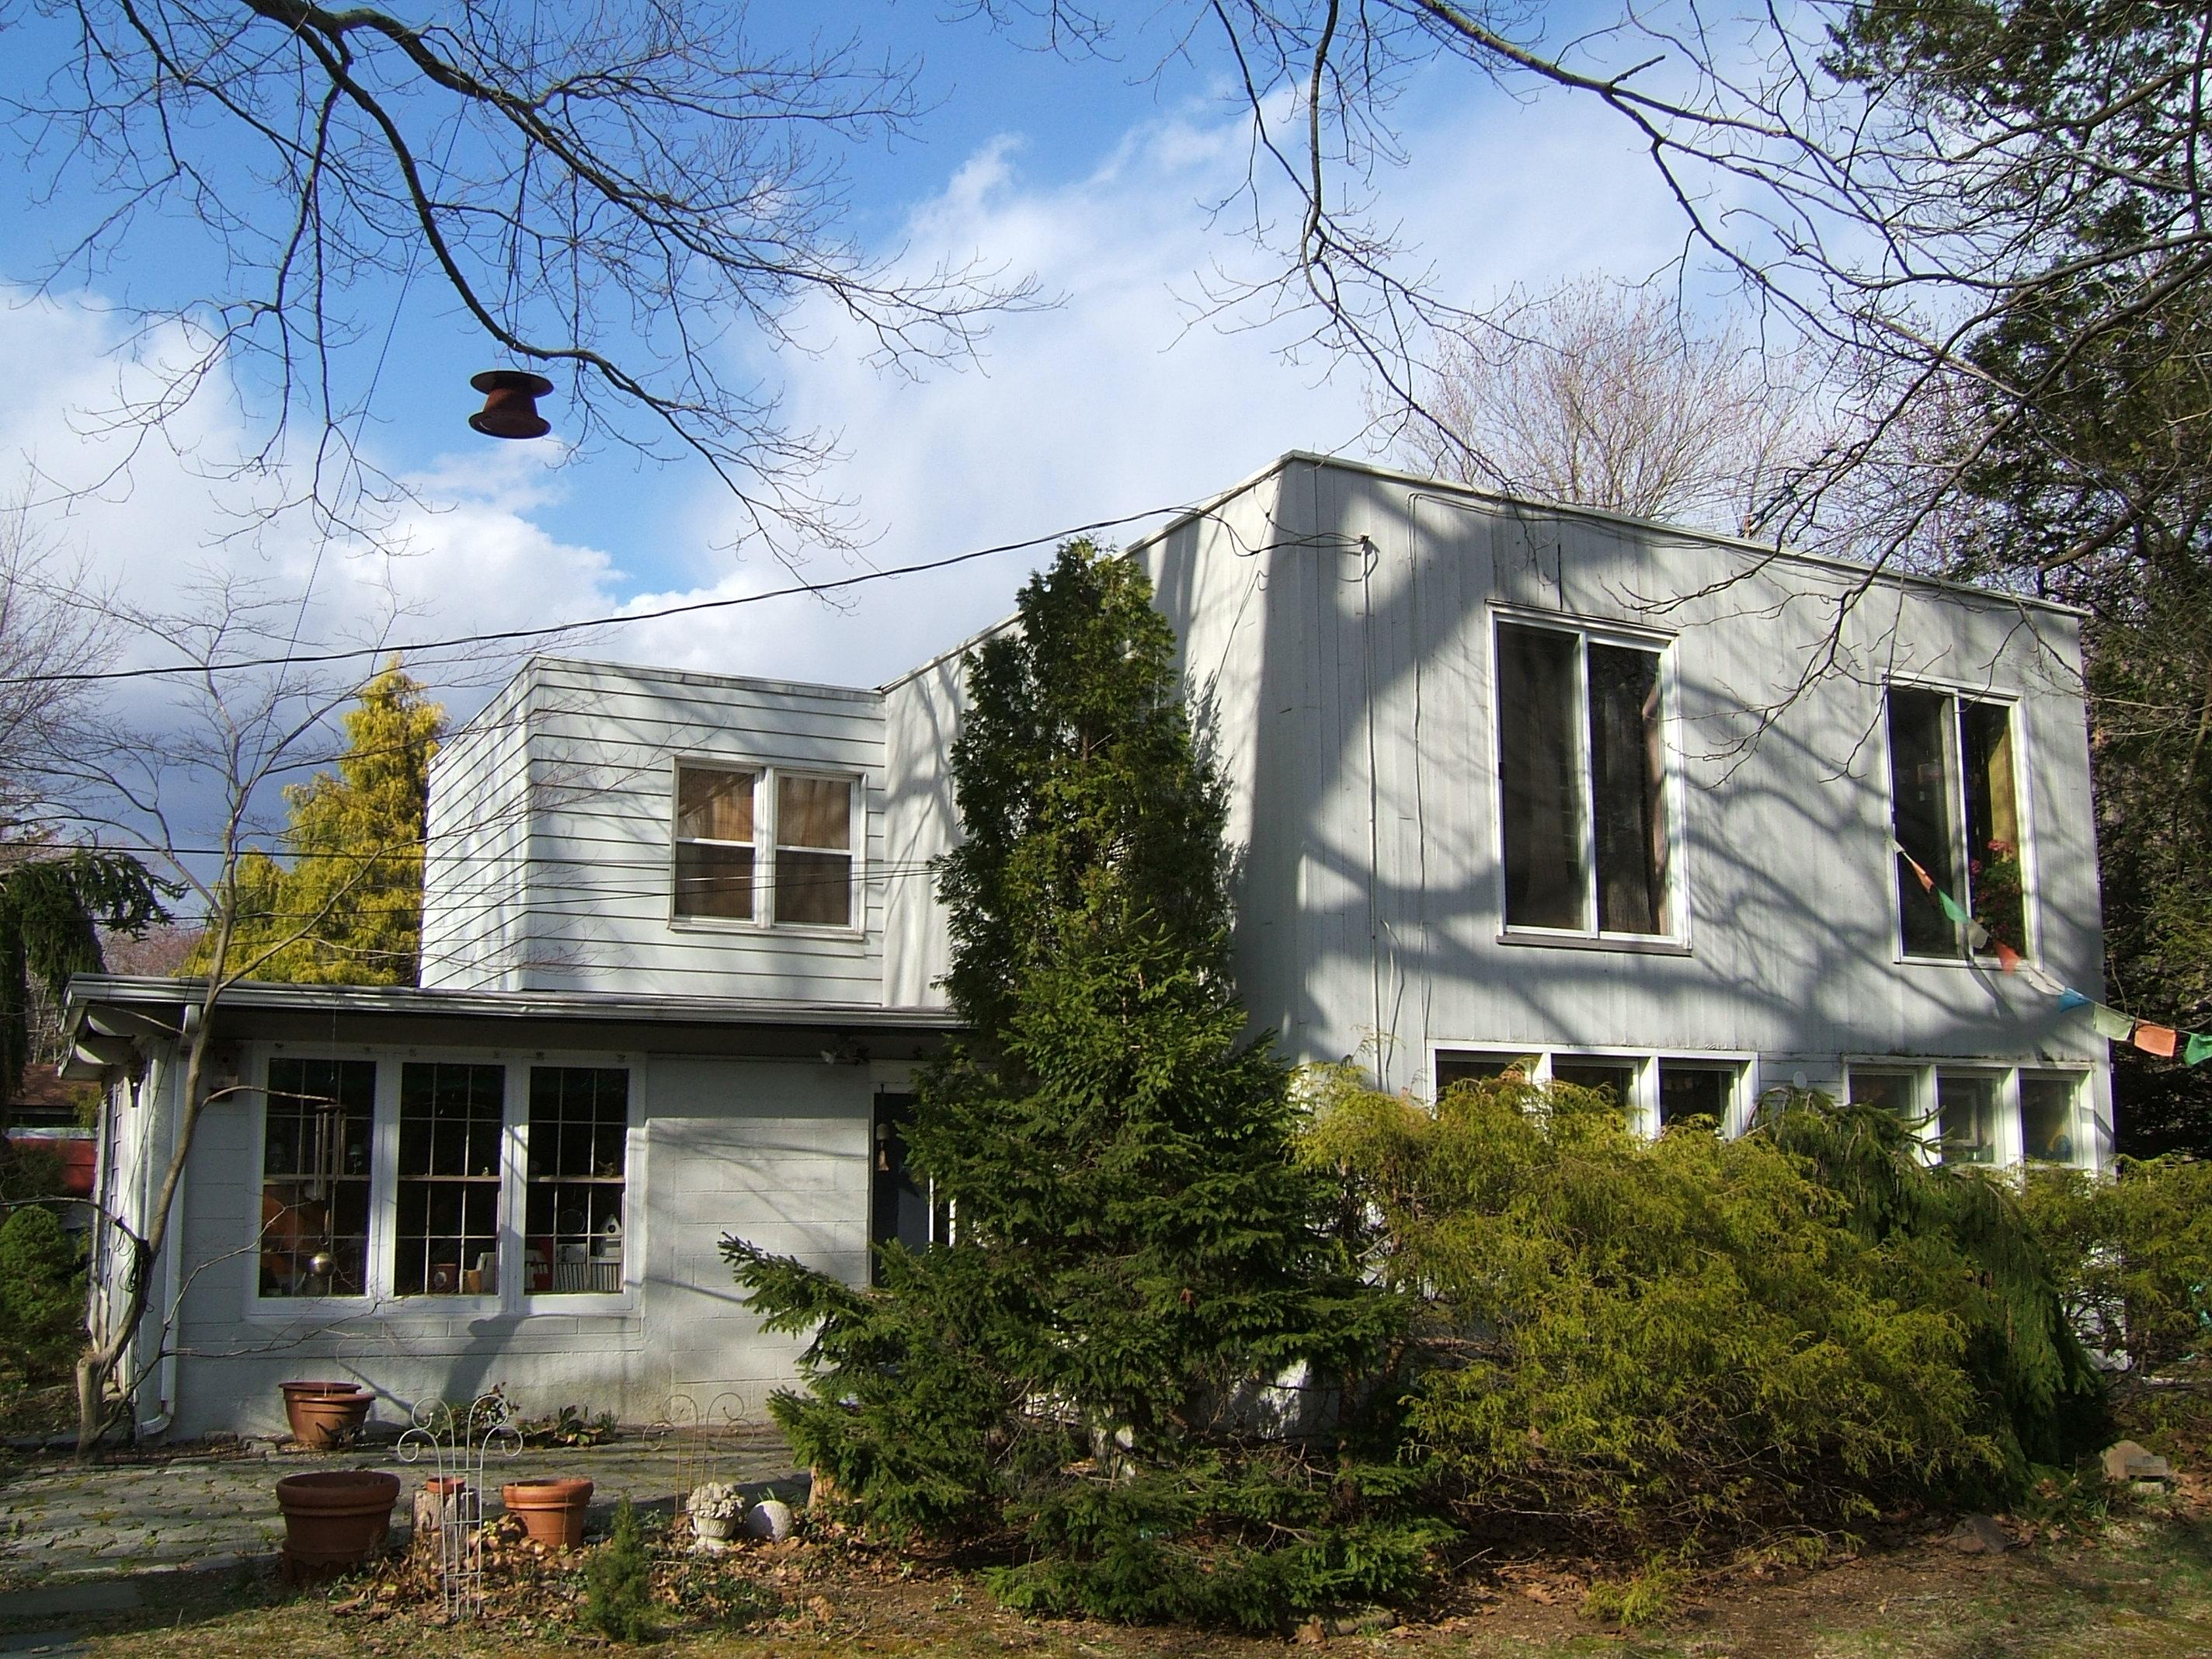 Roosevelt NJ 2A Cube Home